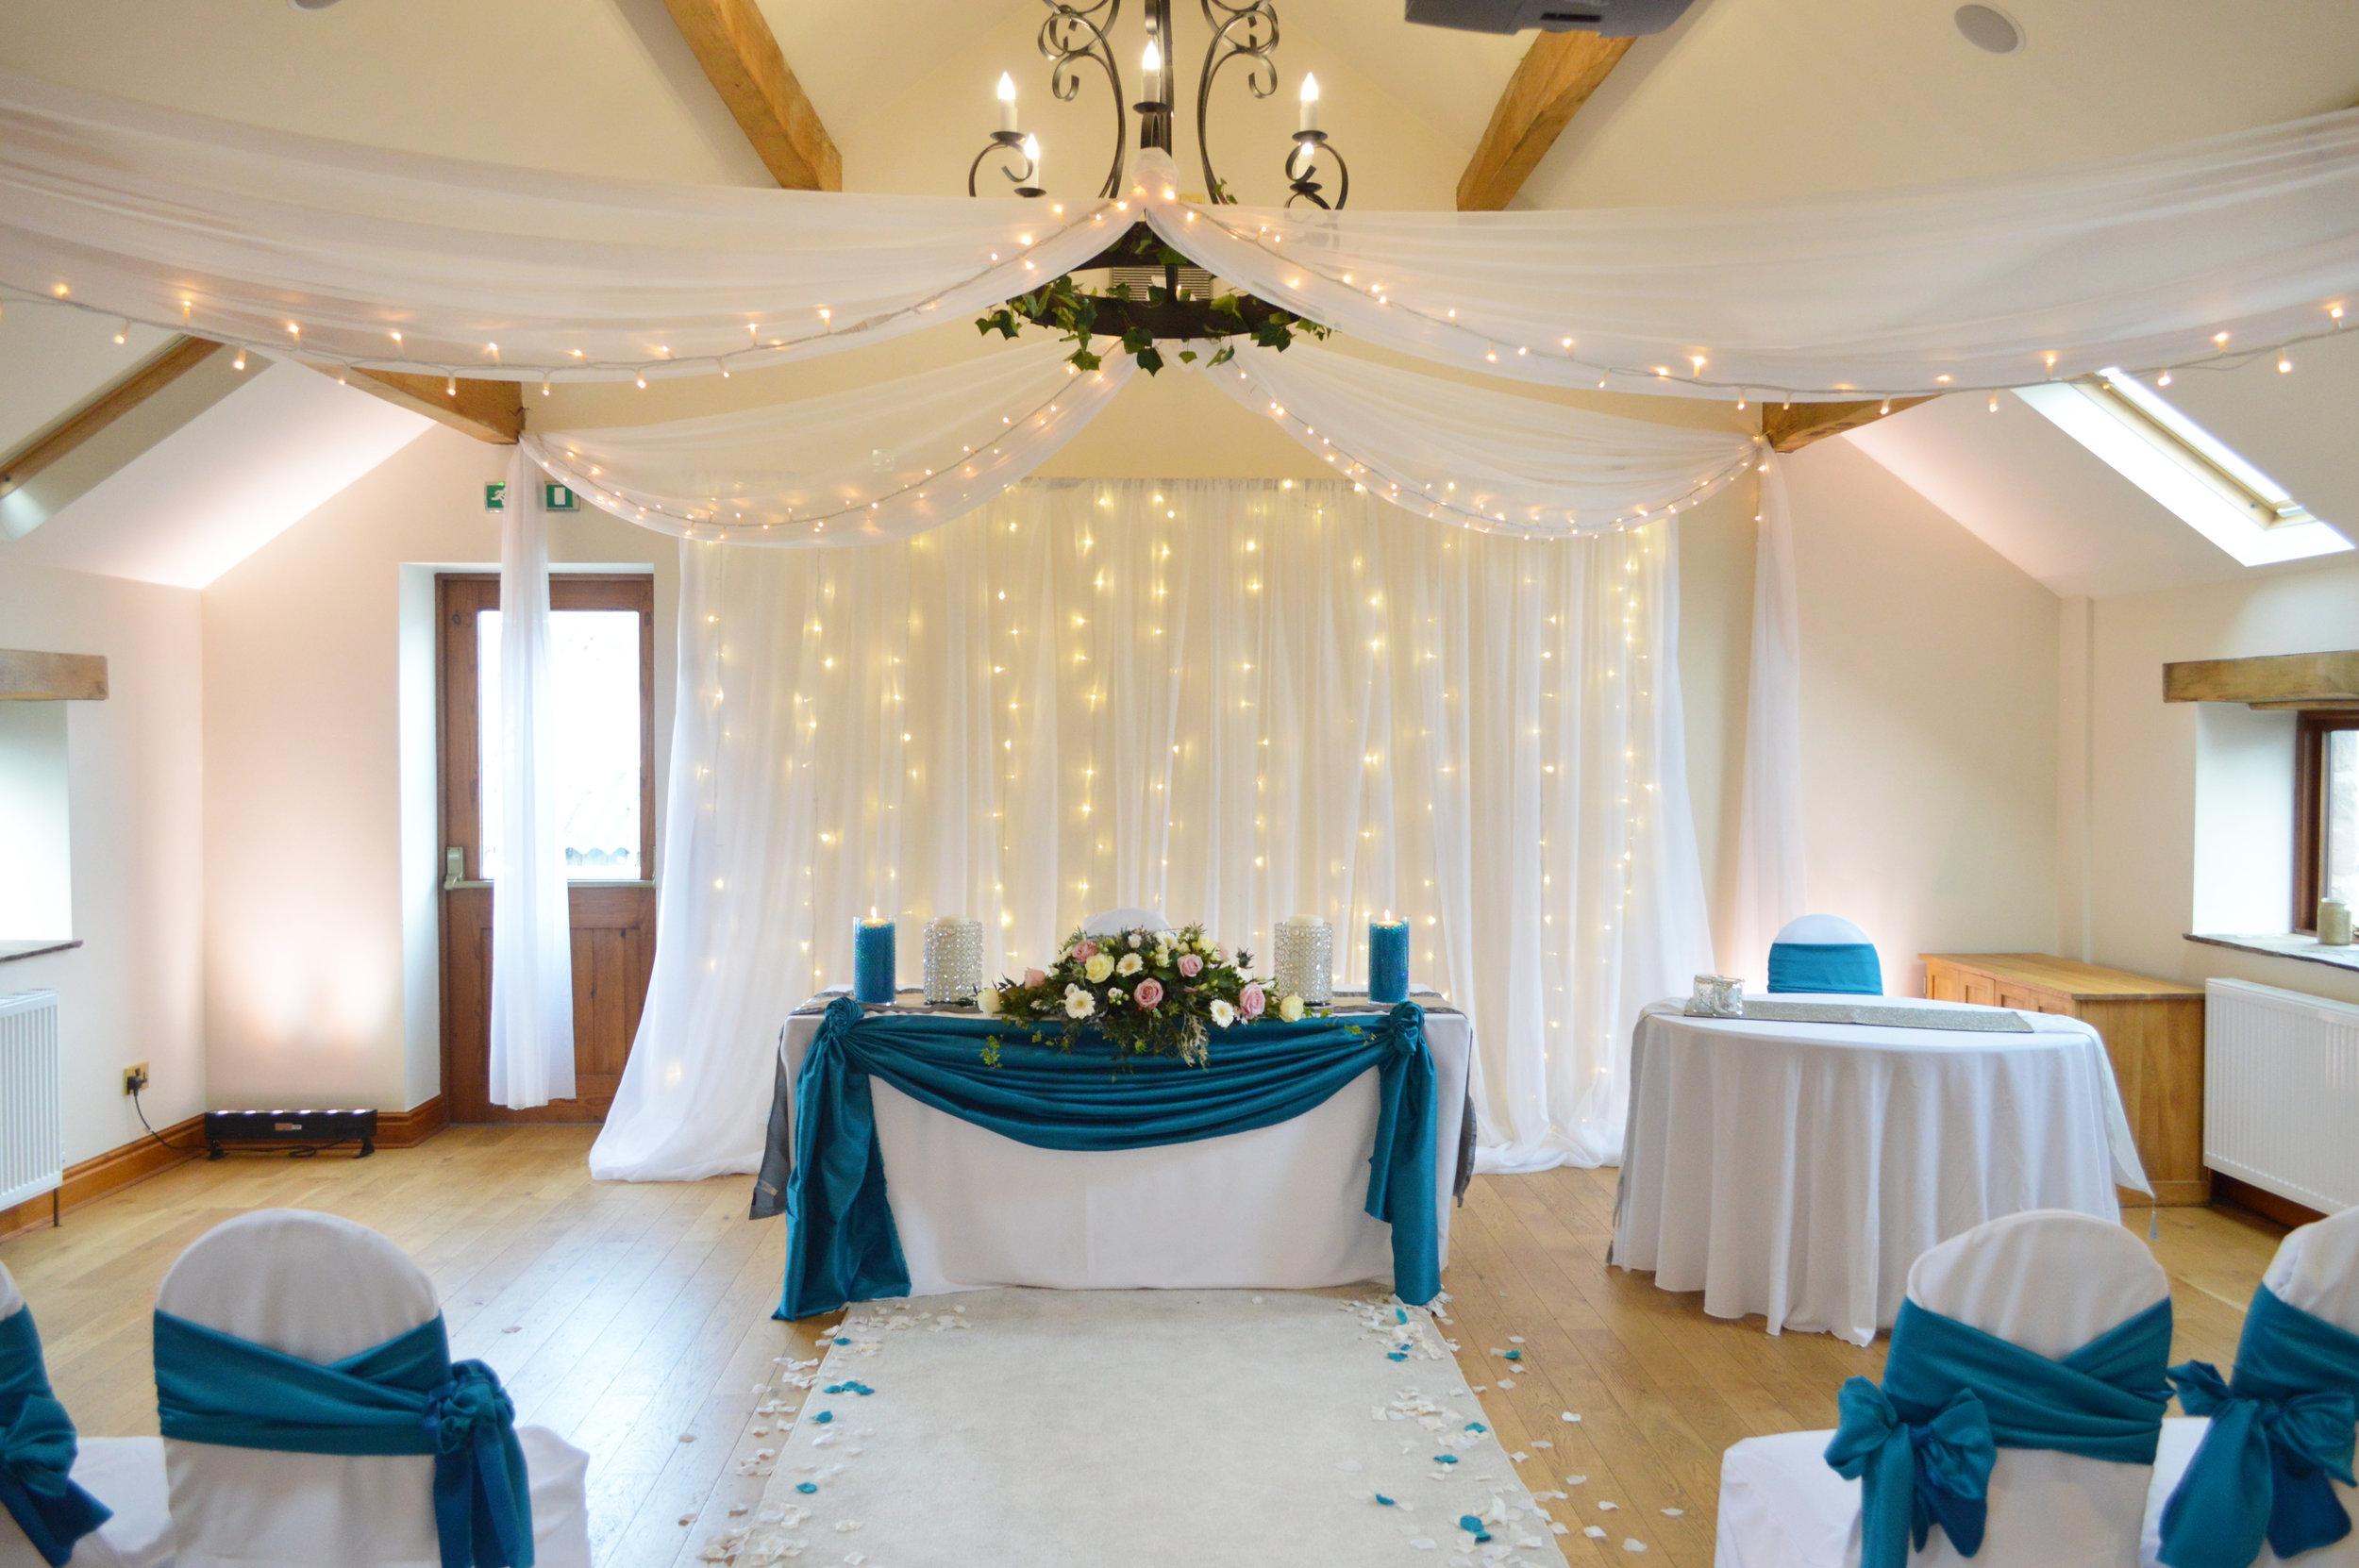 Fairy light backdrop and registrar table drape